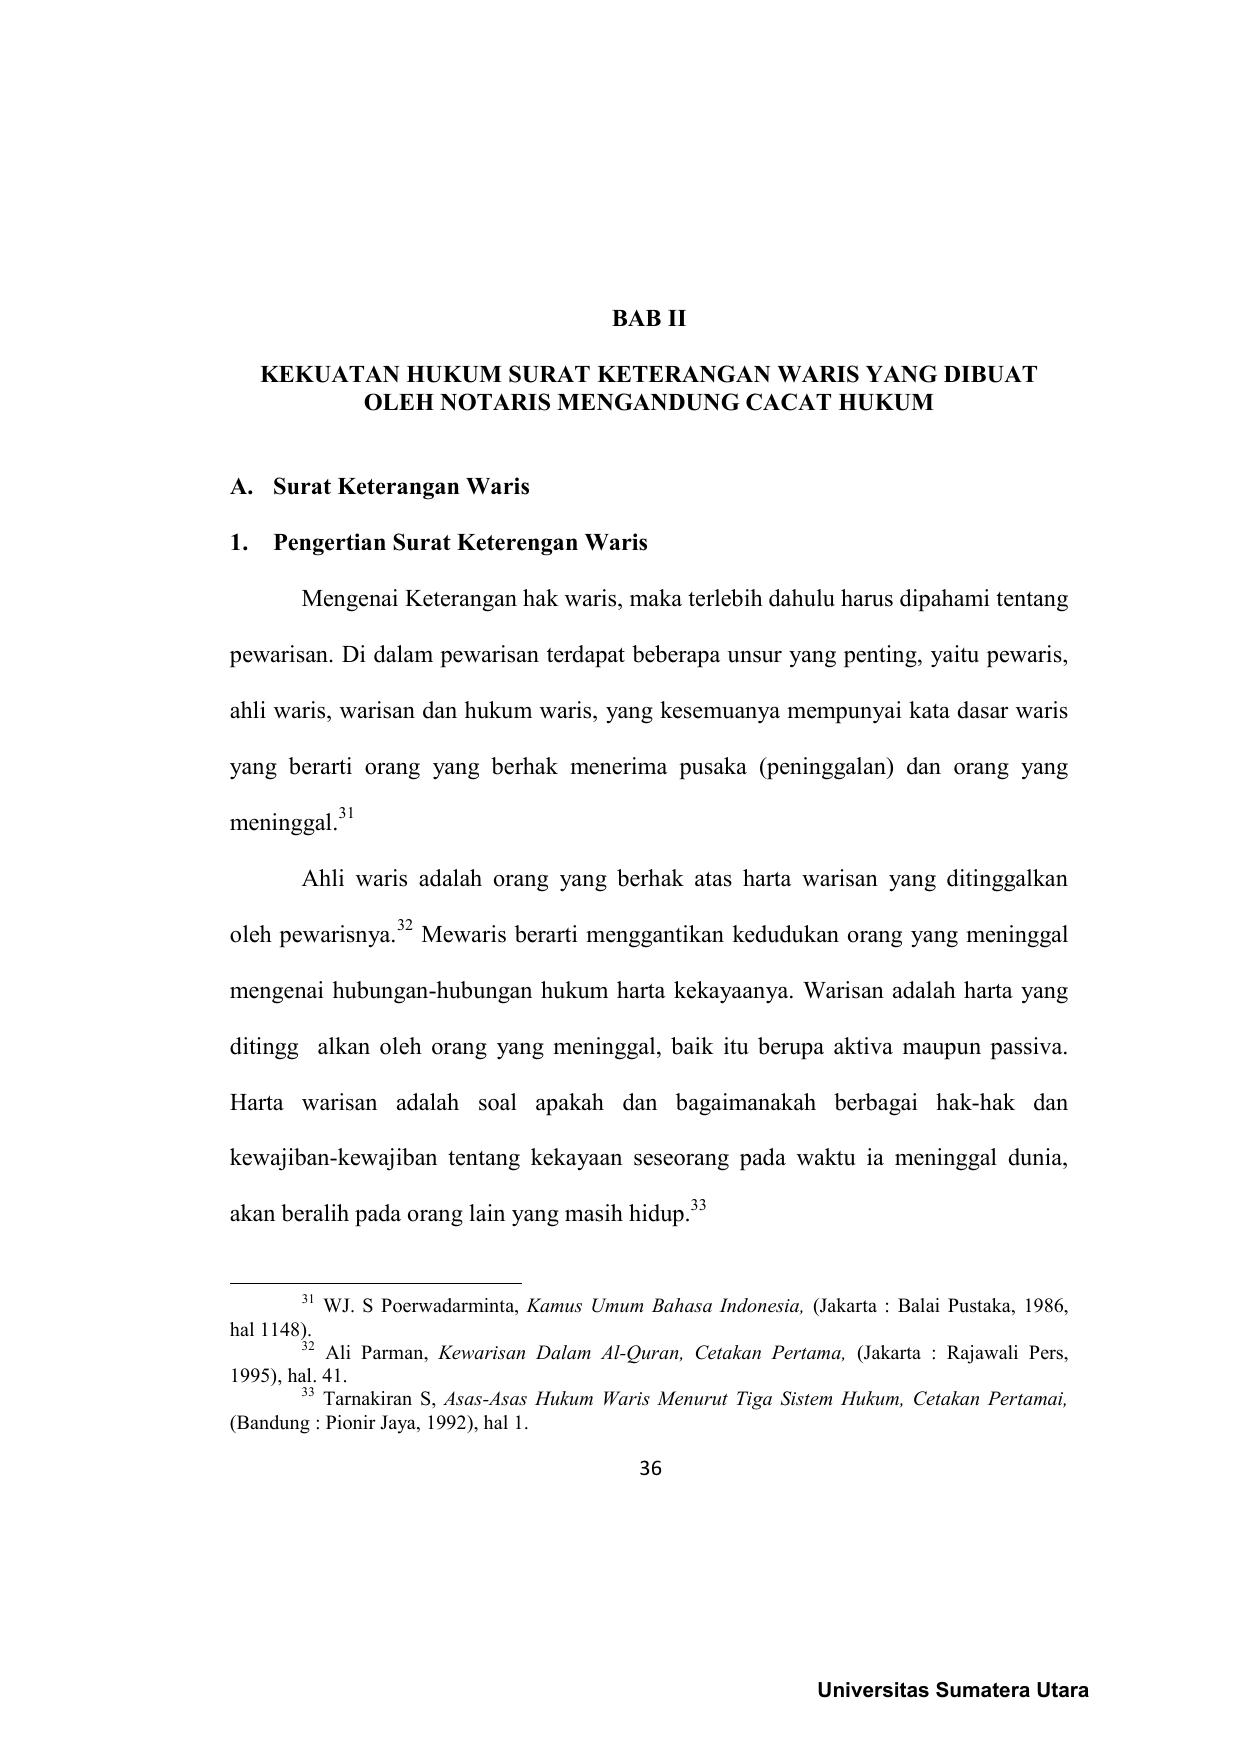 36 Bab Ii Kekuatan Hukum Surat Keterangan Waris